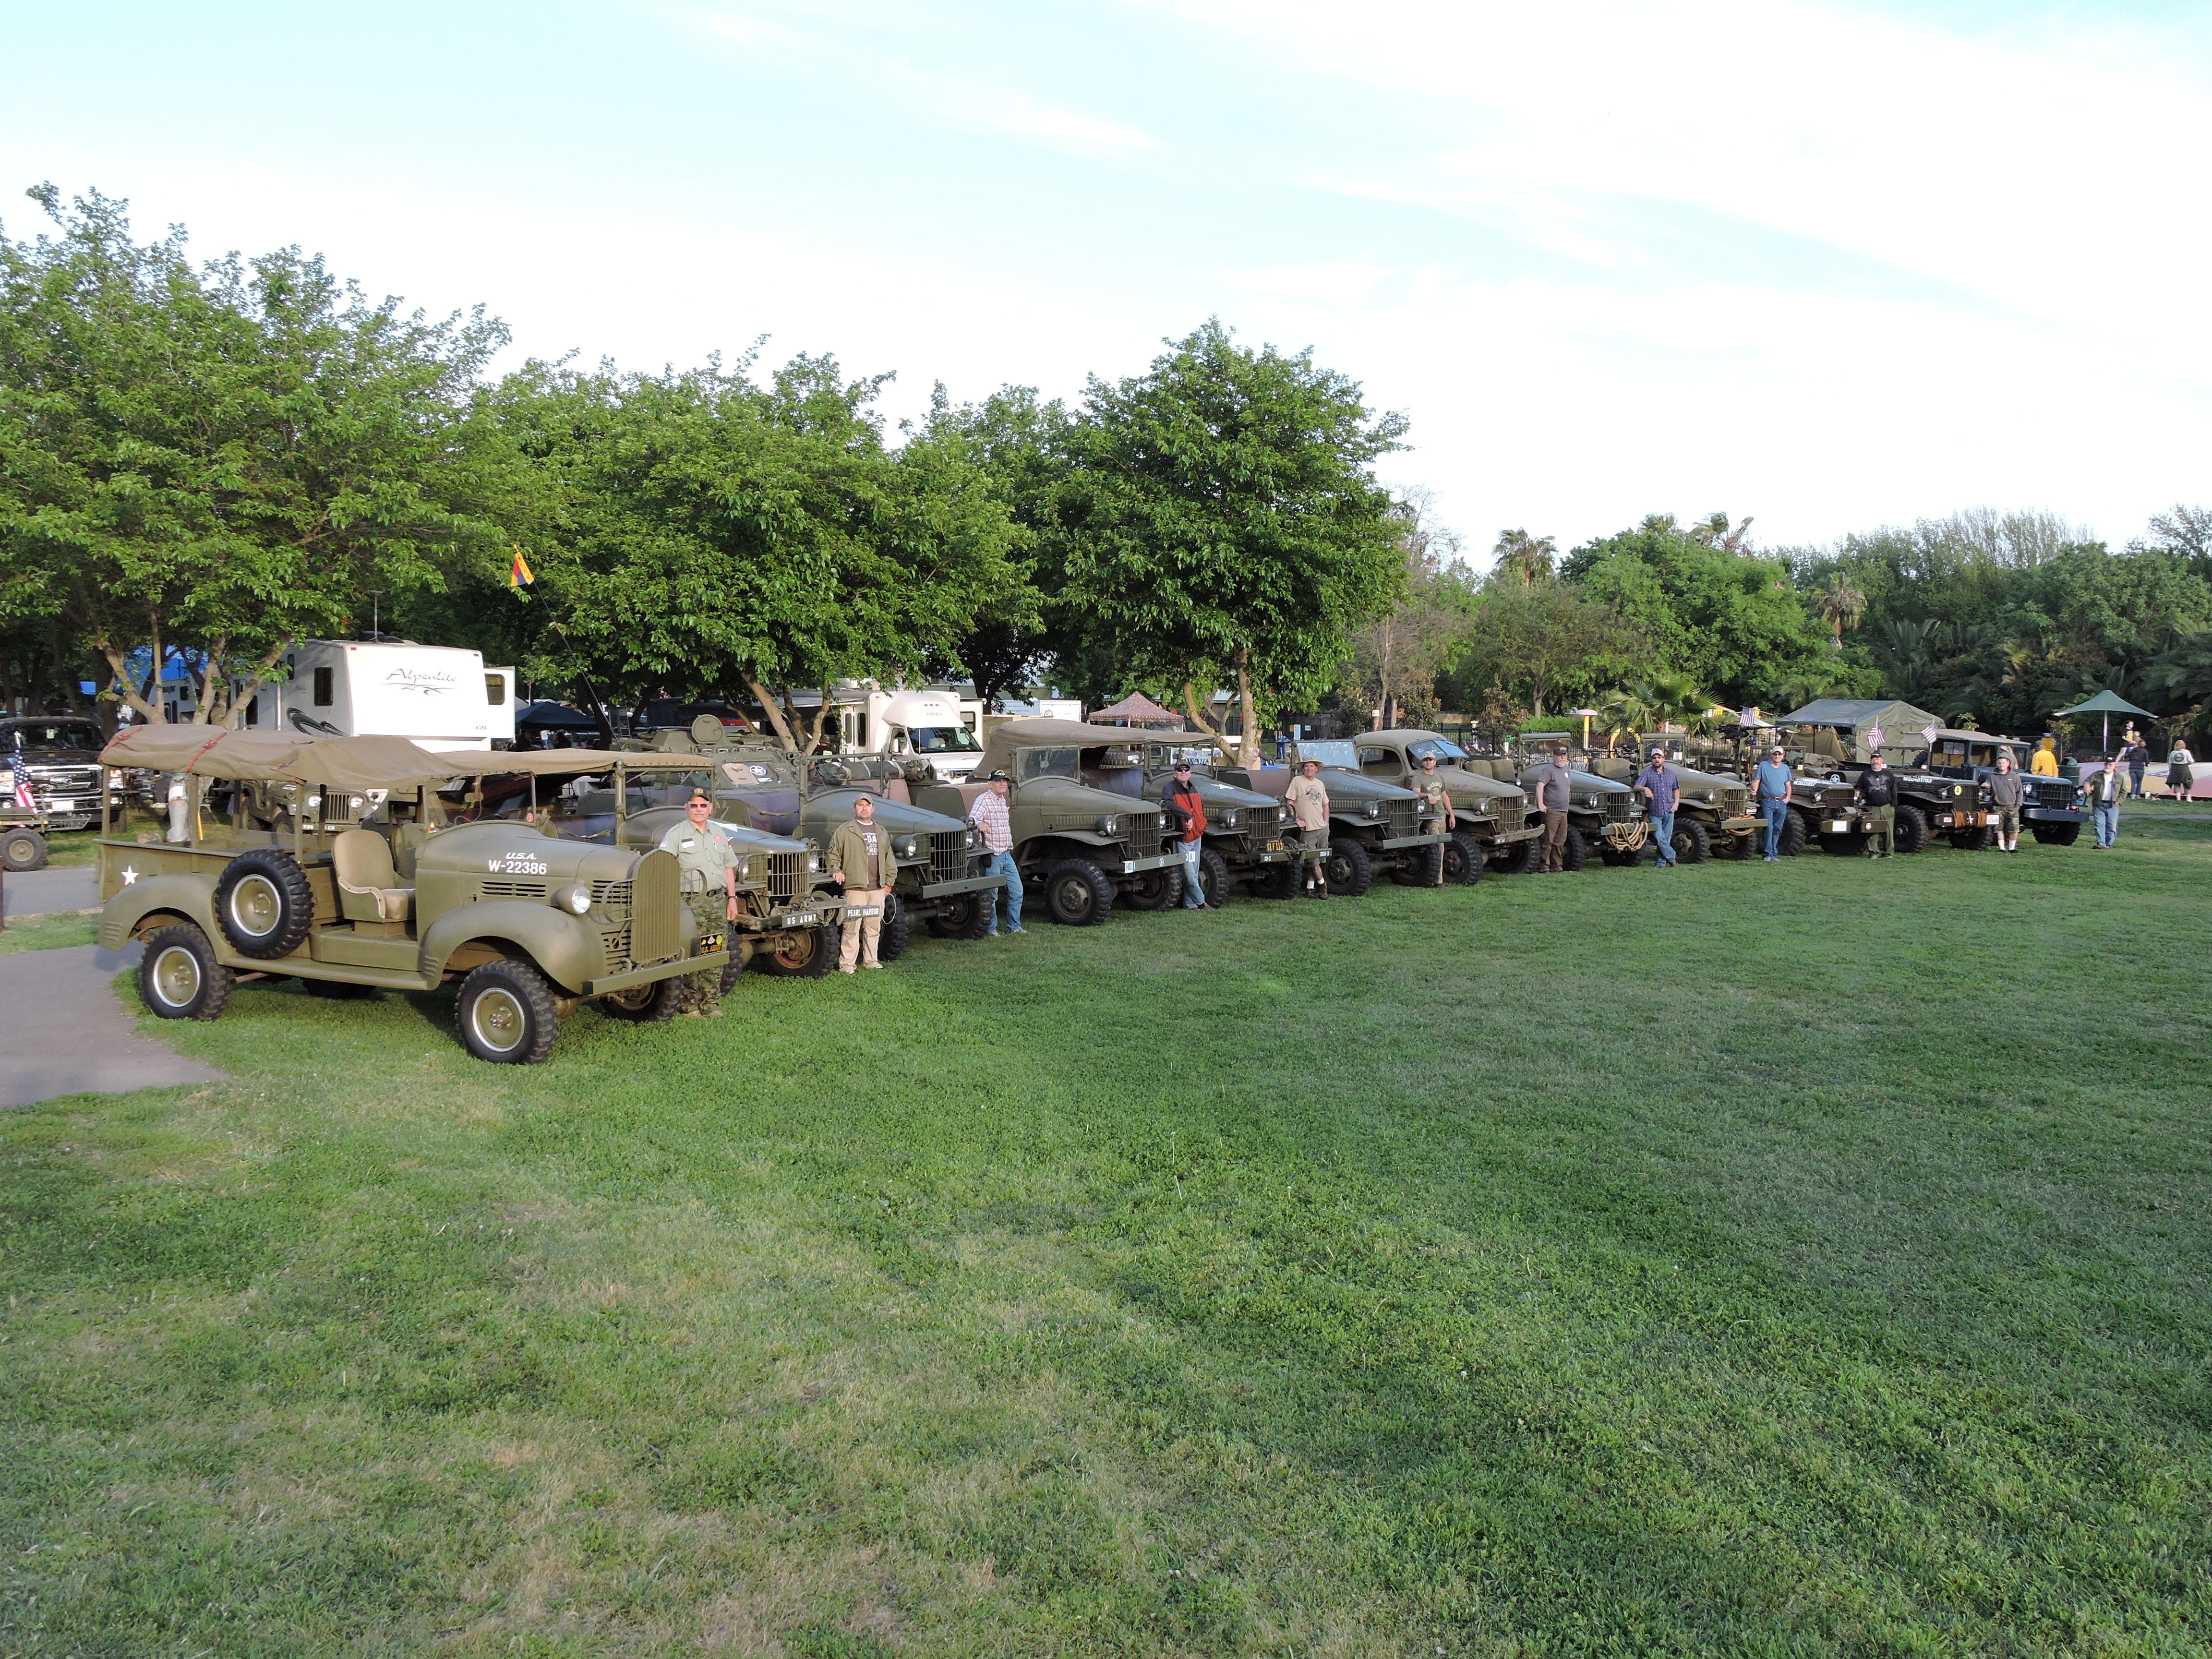 Camp Delta Military Swap Meet and Vehicle Gathering at Tower Park Resort near Lodi, California.